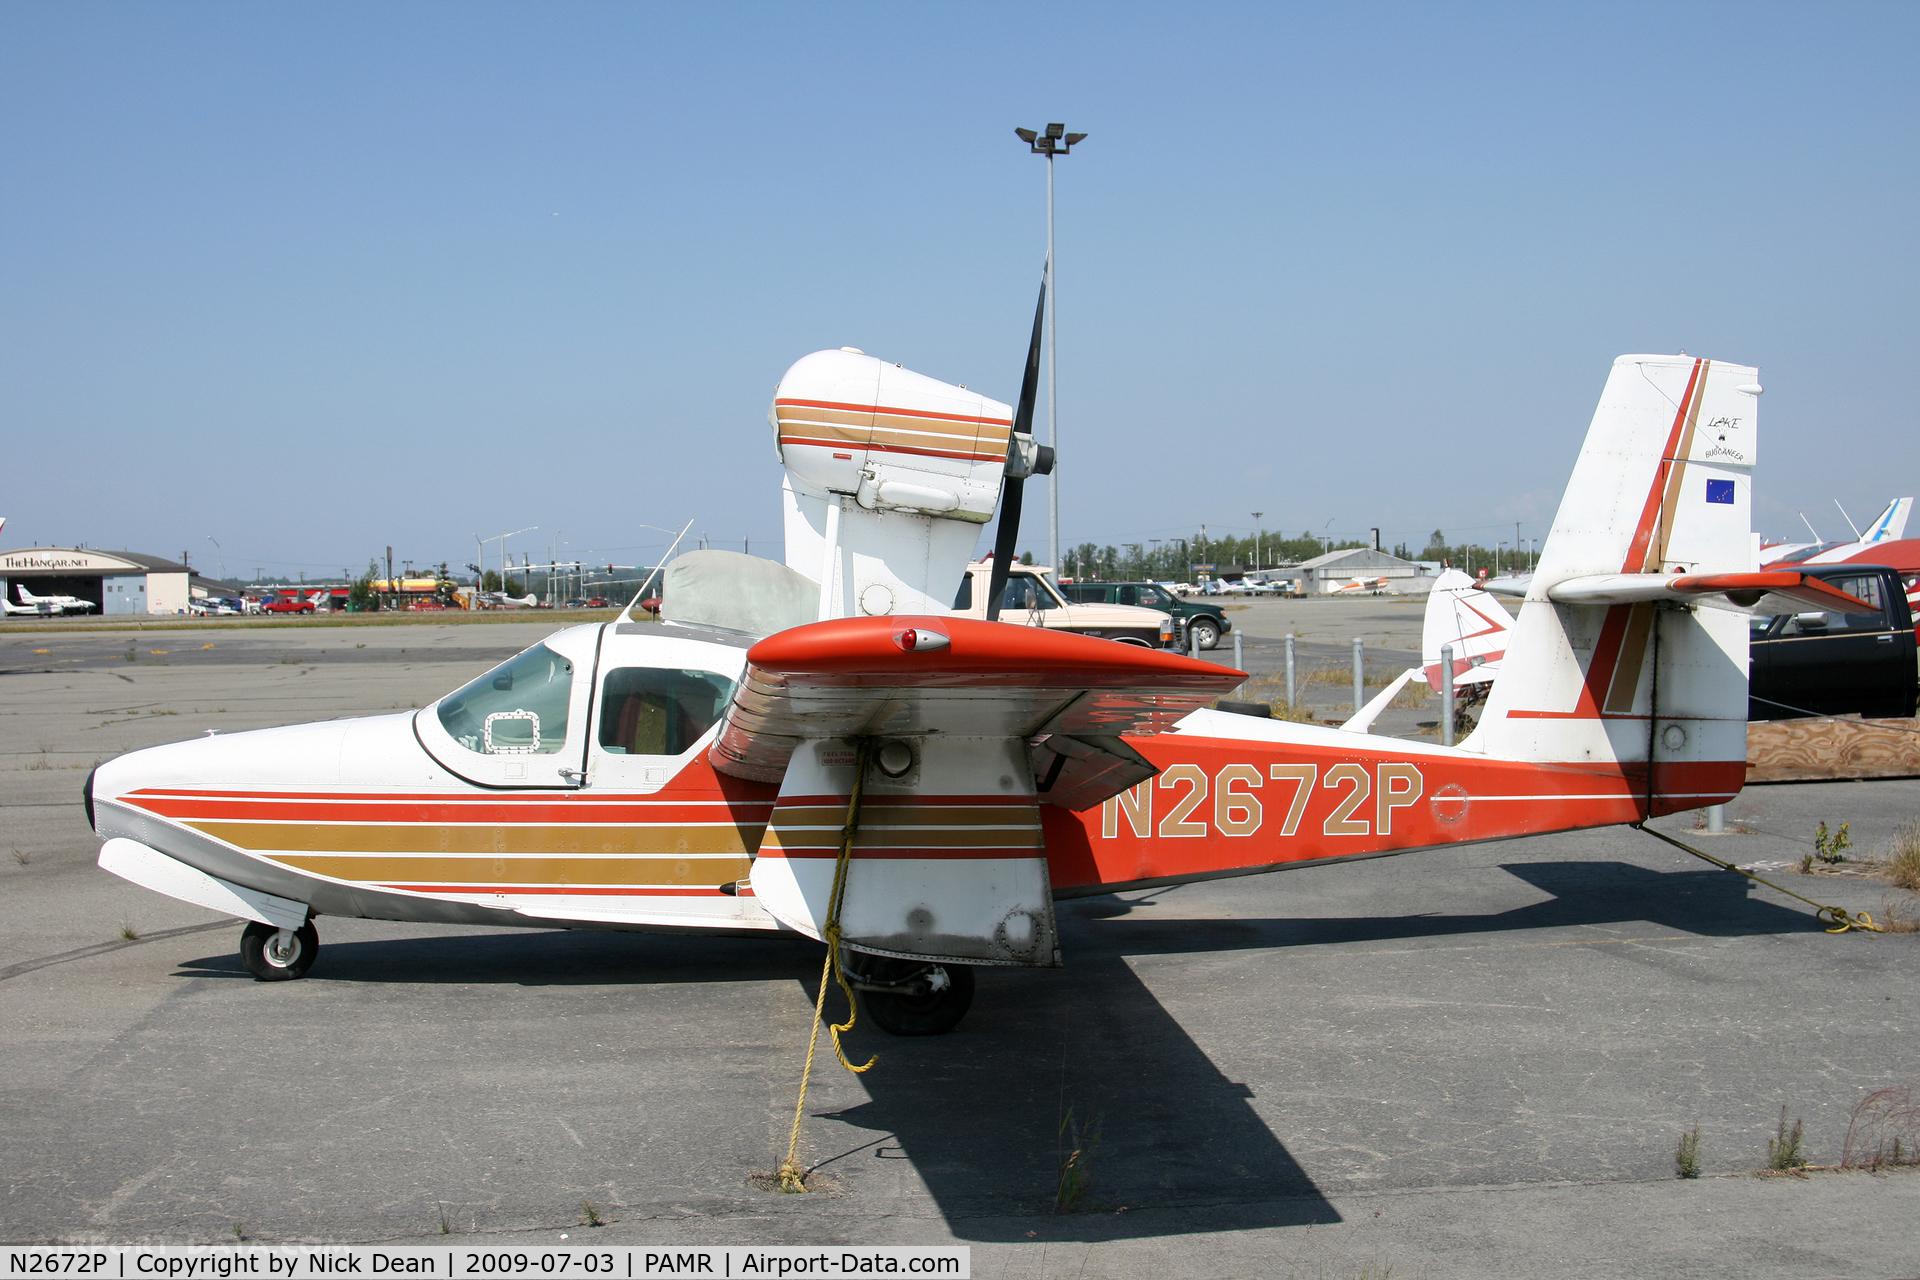 N2672P, 1978 Consolidated Aeronautics Inc. LAKE LA-4-200 C/N 884, PAMR